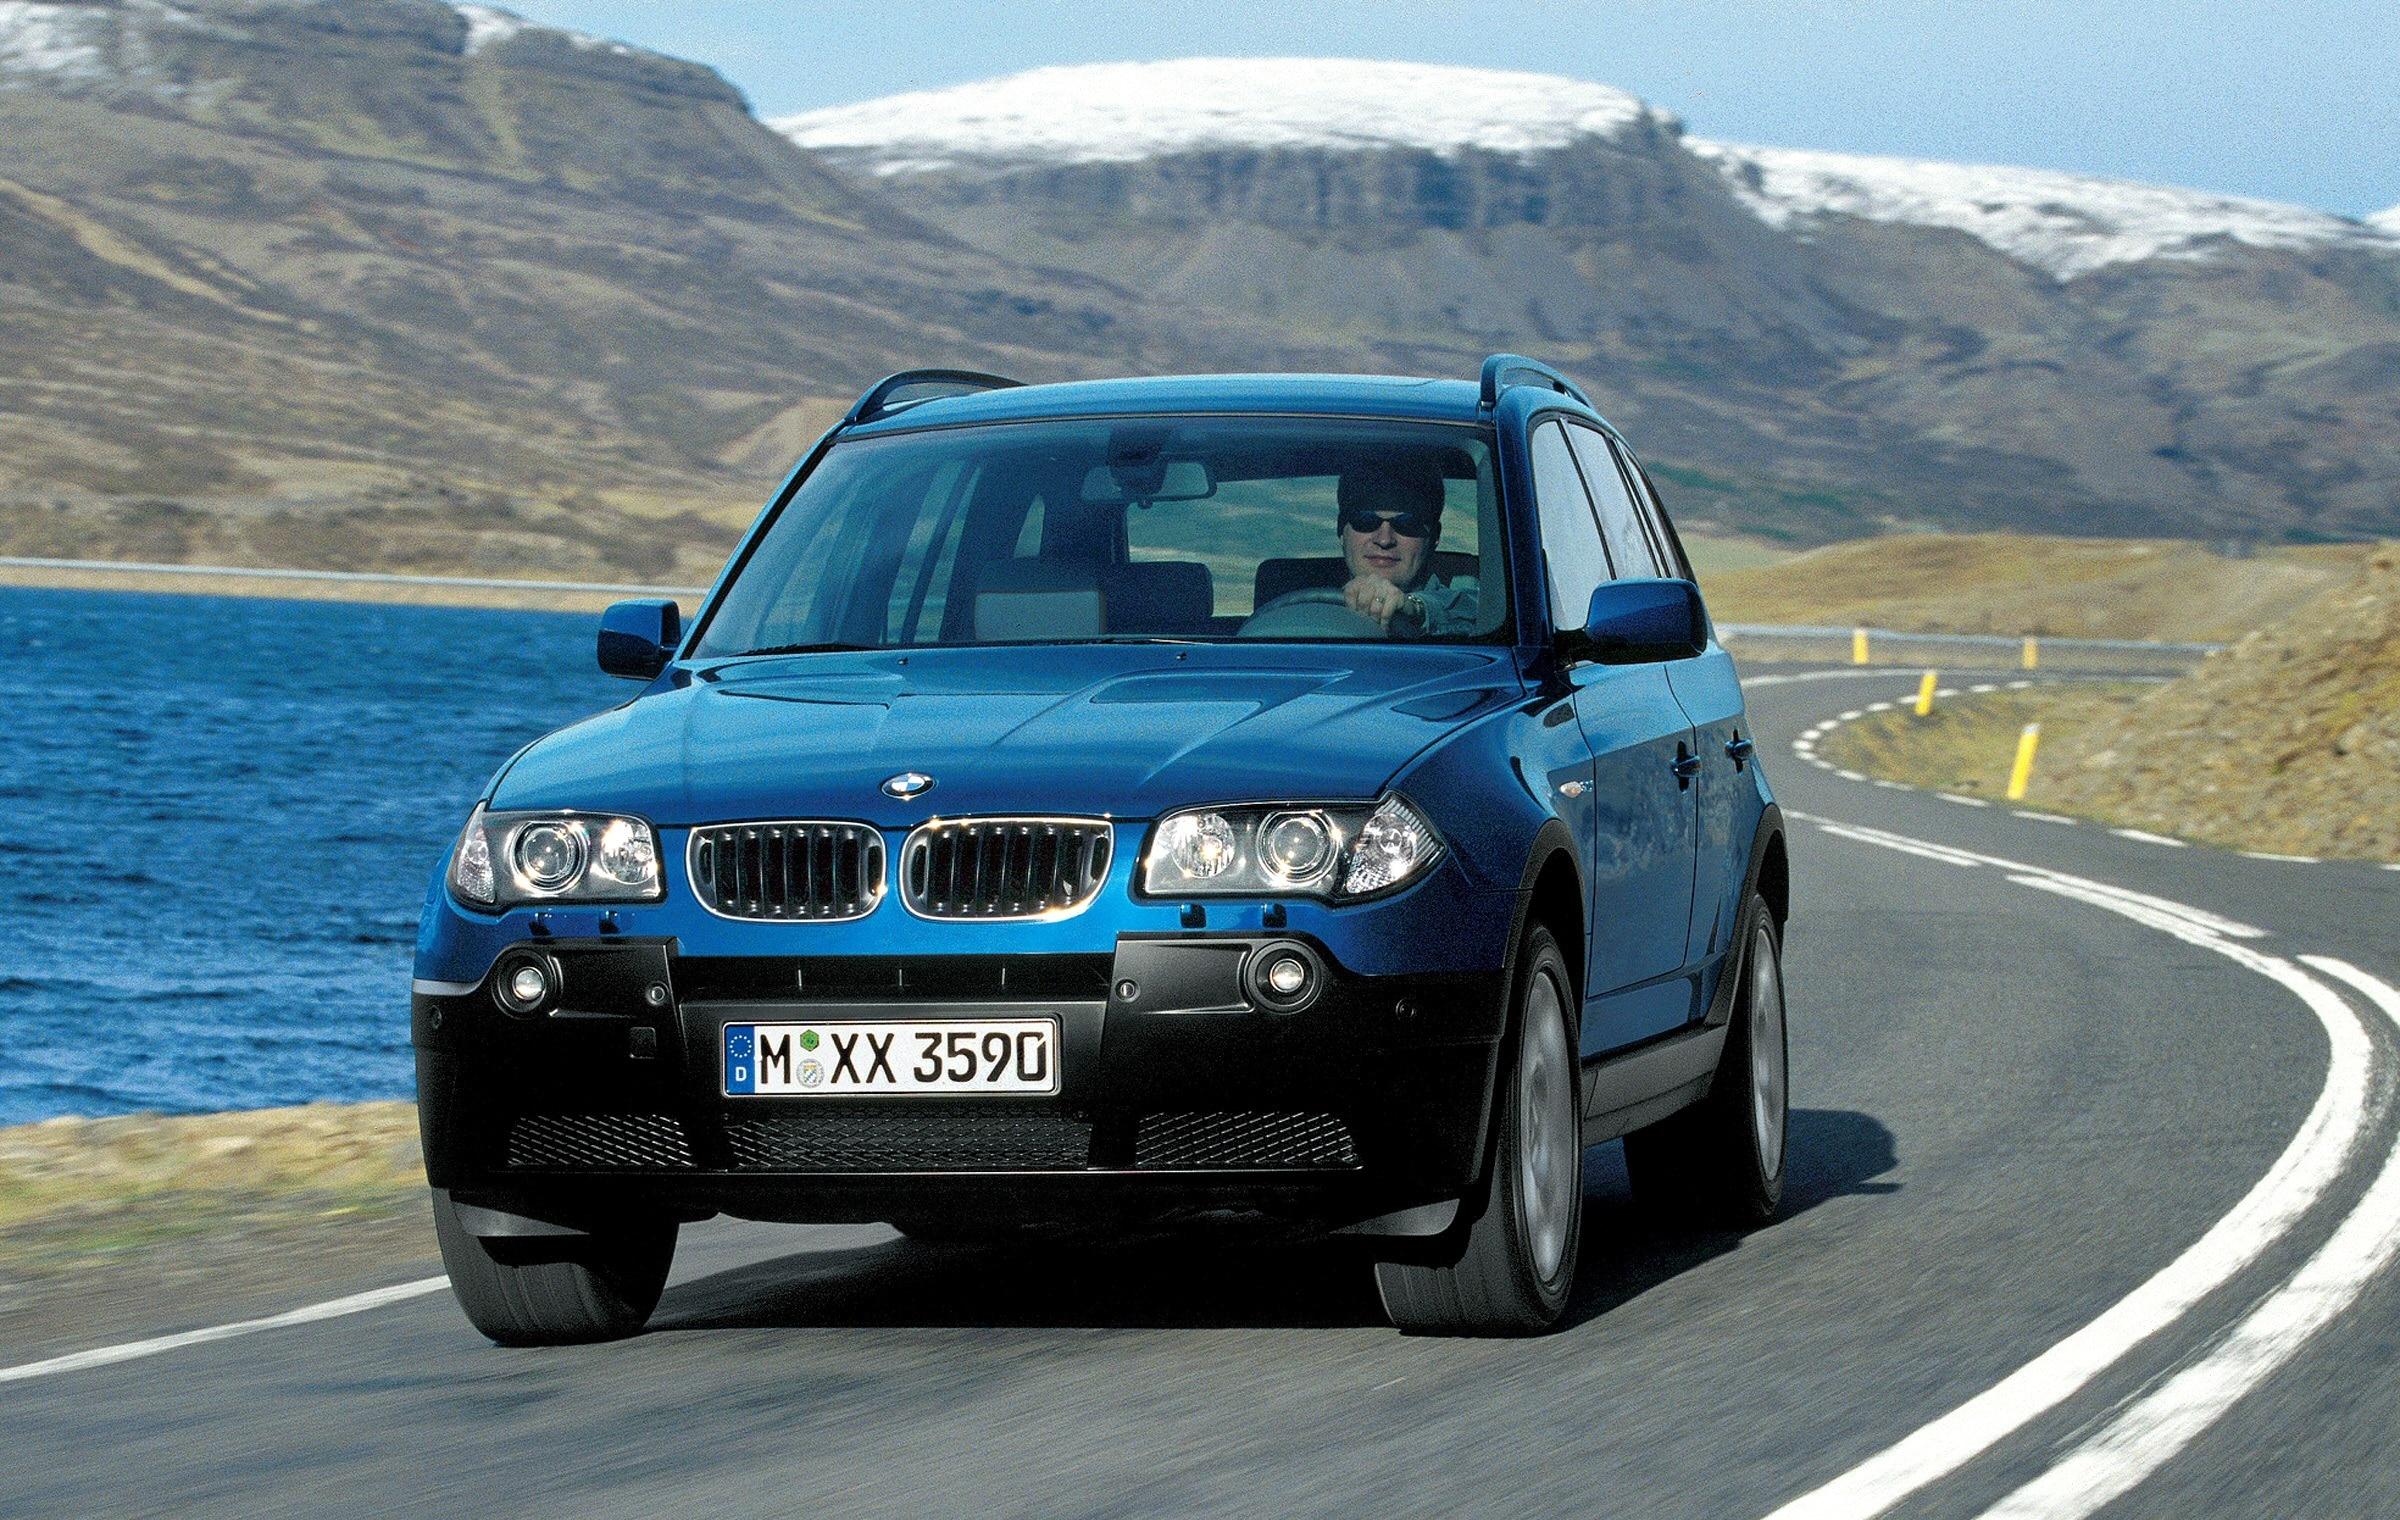 BMW X3, X3, BMW, X5, motoring, ebay motors, cars, classic car, retro car, motoring, automotive, used car, cheap car, bargain car, featured, car sales, buying guide, www.not2grand.co.uk, not2grand